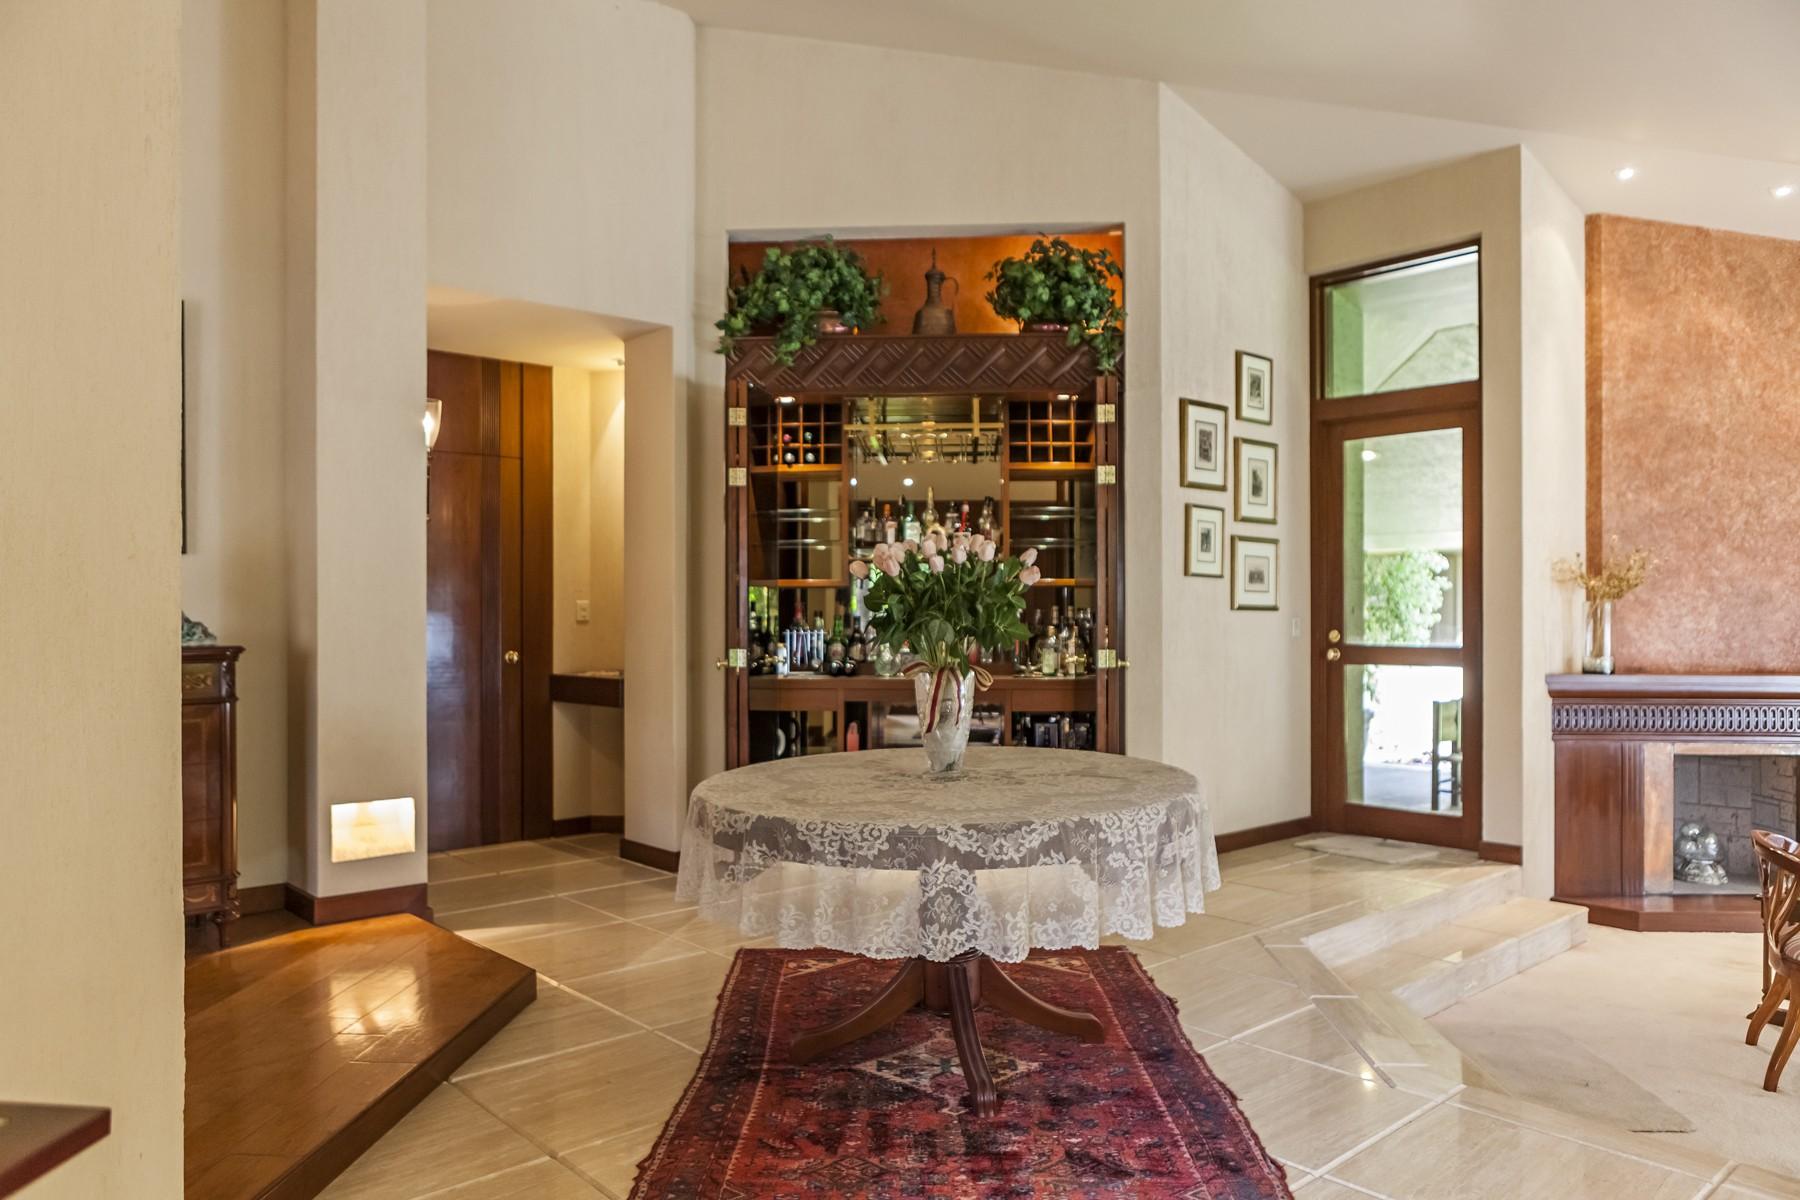 Additional photo for property listing at Santa Isabel en San Gonzalo, Guadalajara. San Gonzalo Zapopan Zapopan, Jalisco 45110 Mexico